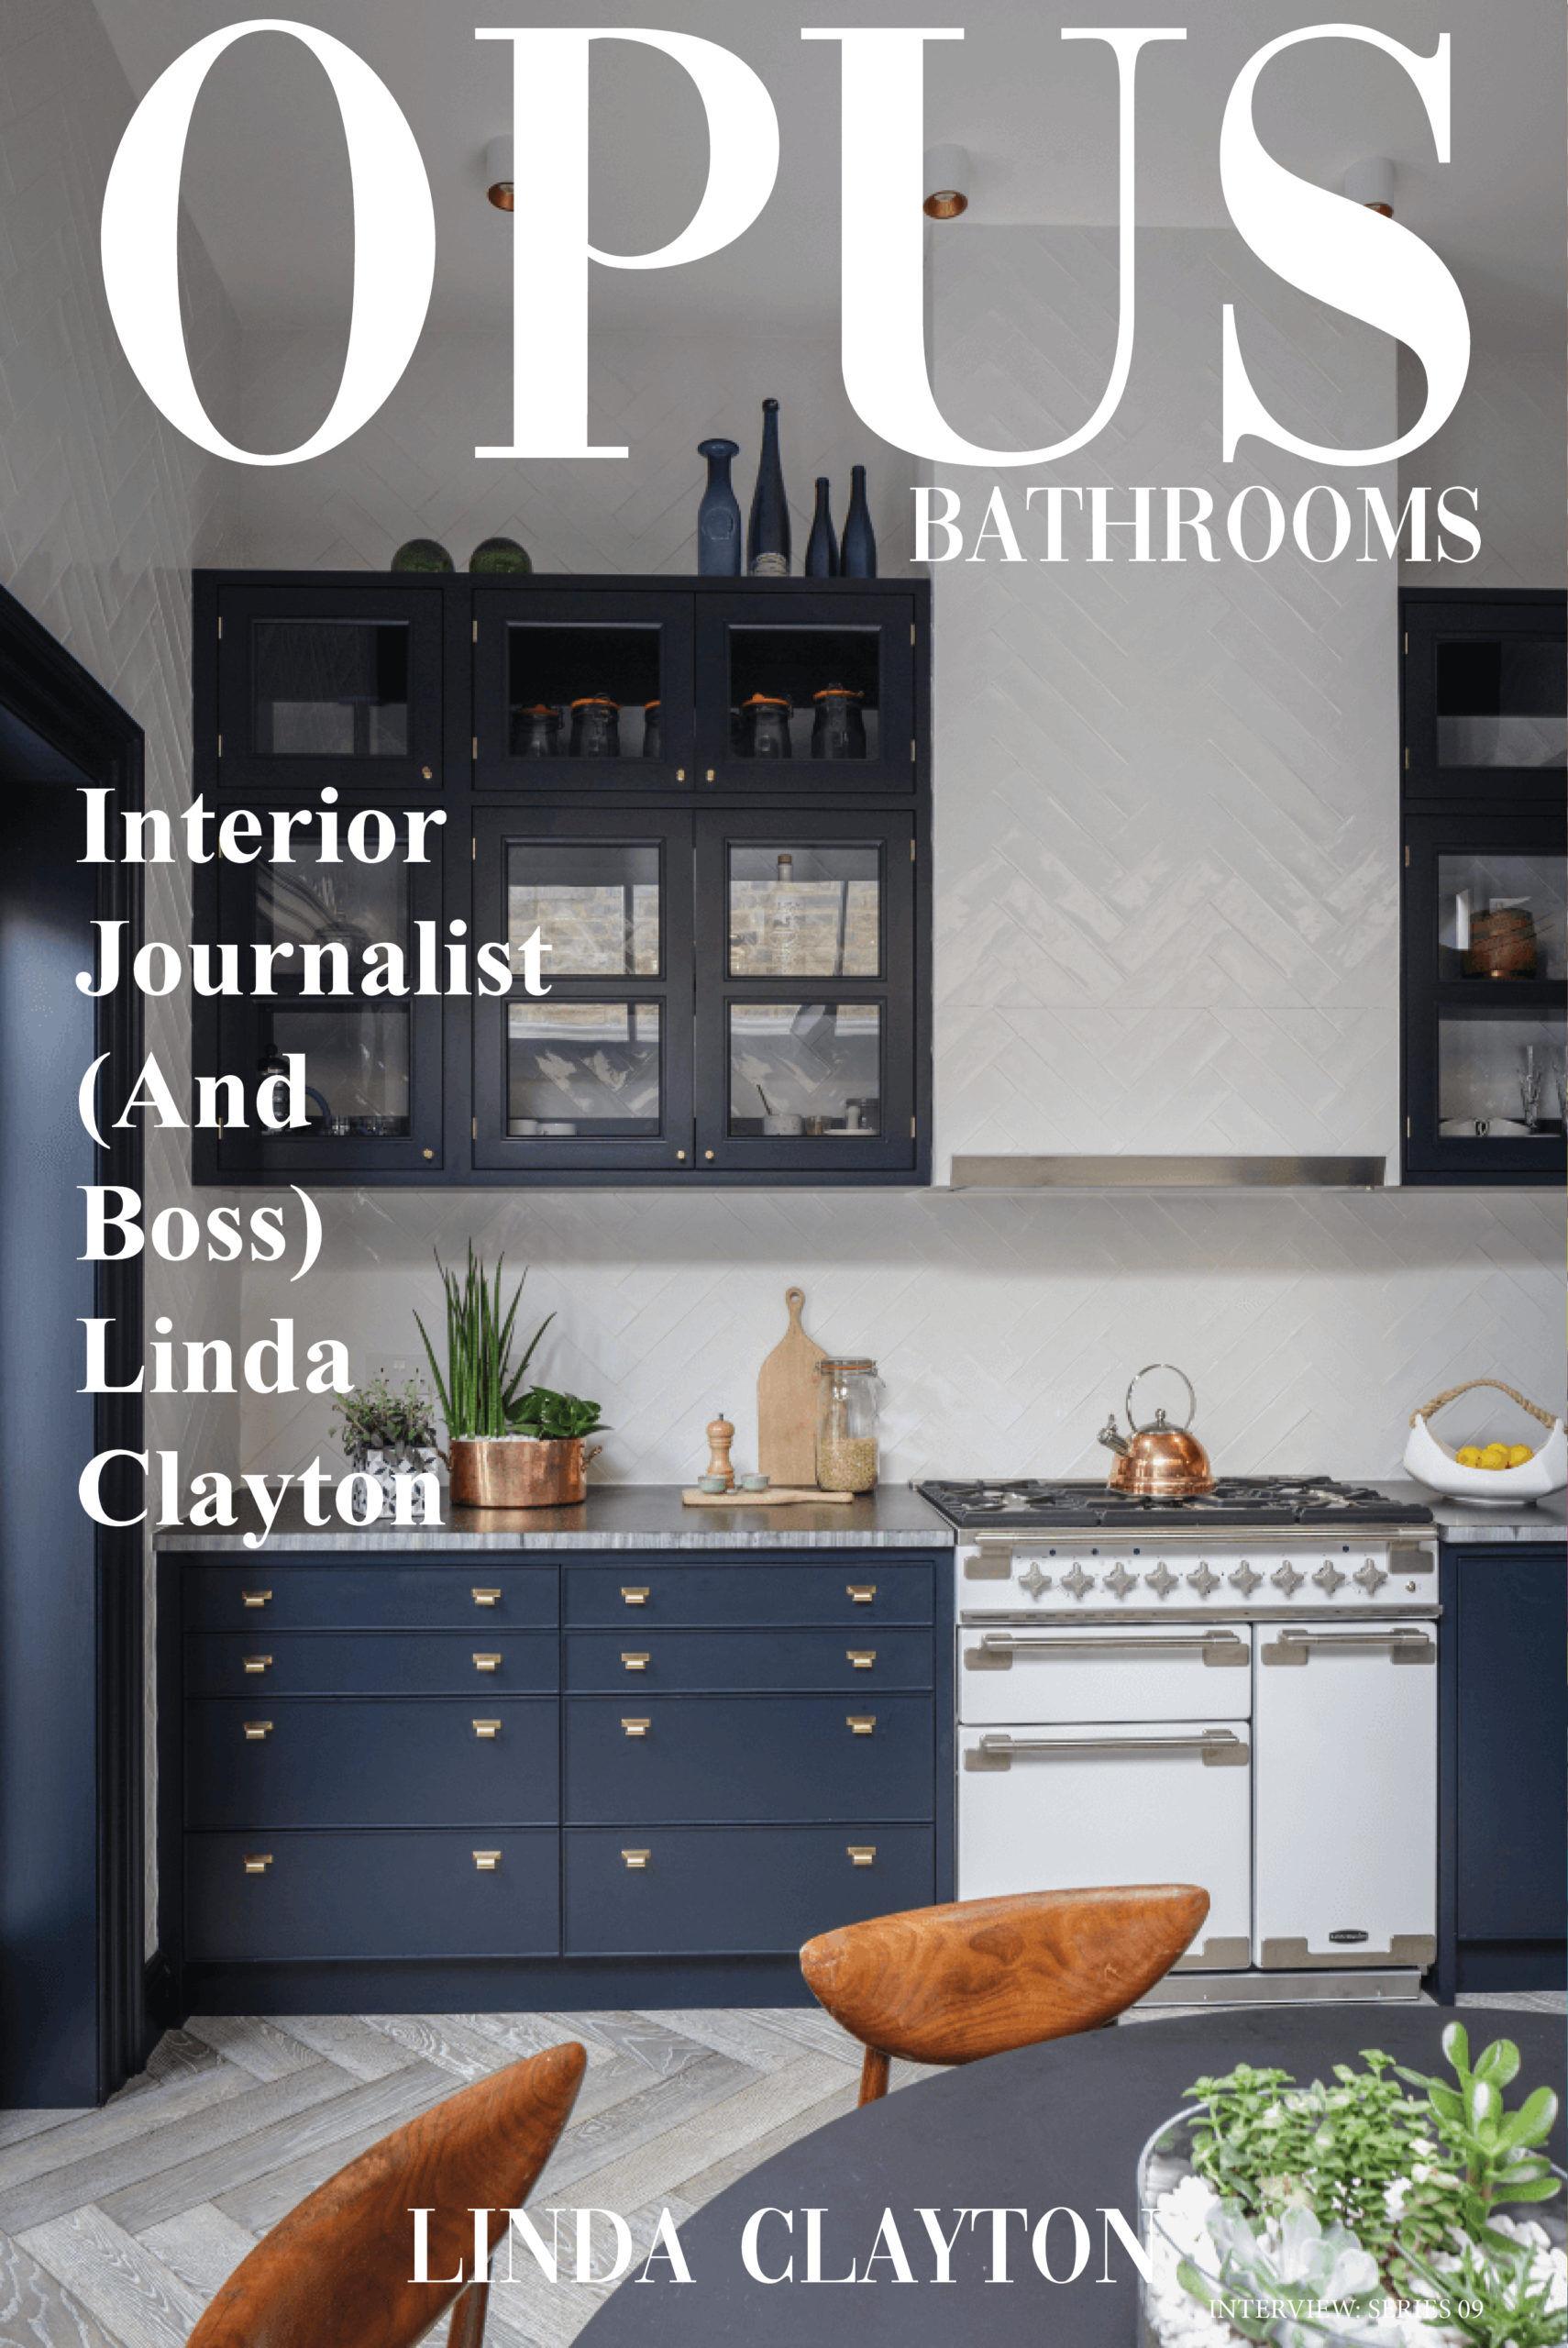 Meet The Writer (and Boss) Linda Clayton